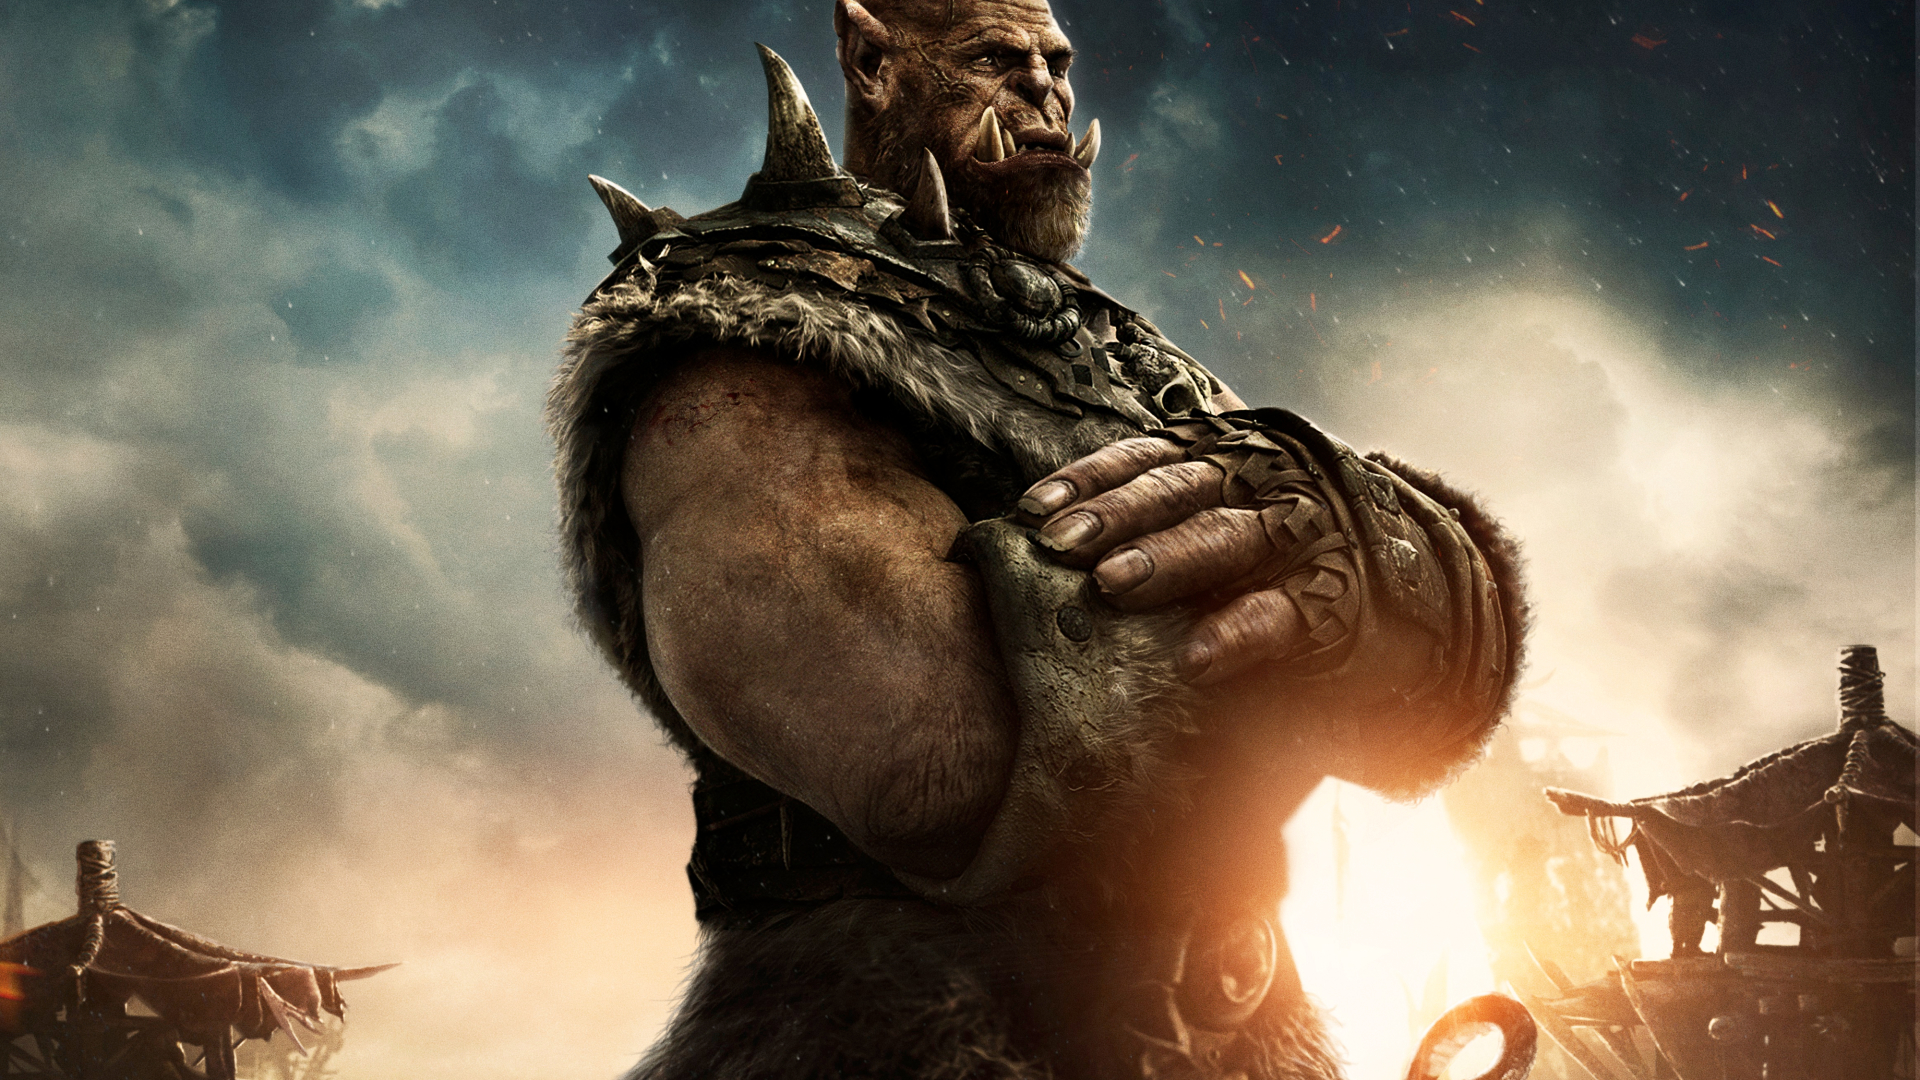 Warcraft Movie Wallpaper Warcraft 2016 Wallpaper 41591122